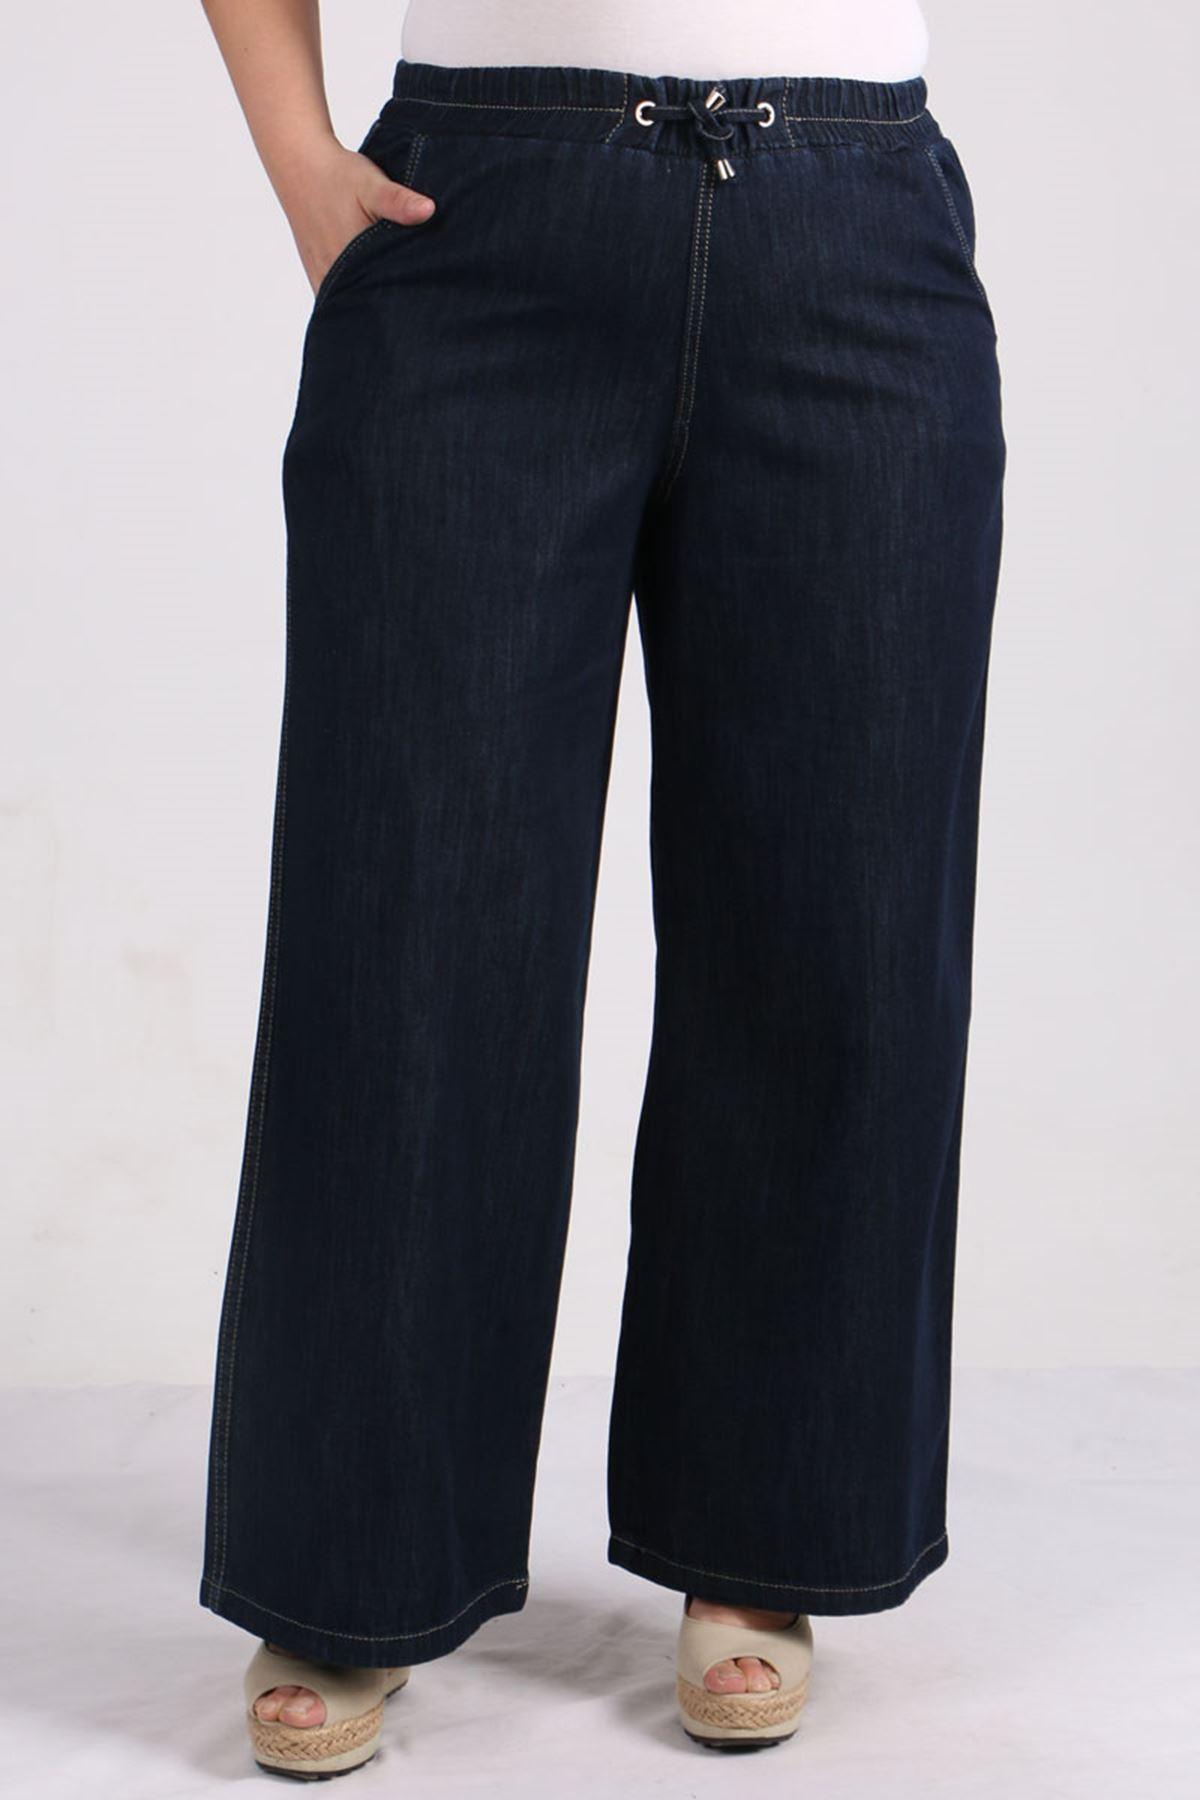 9124 Plus Size Elastic Waist Wide Leg Jeans - Dark Navy Blue